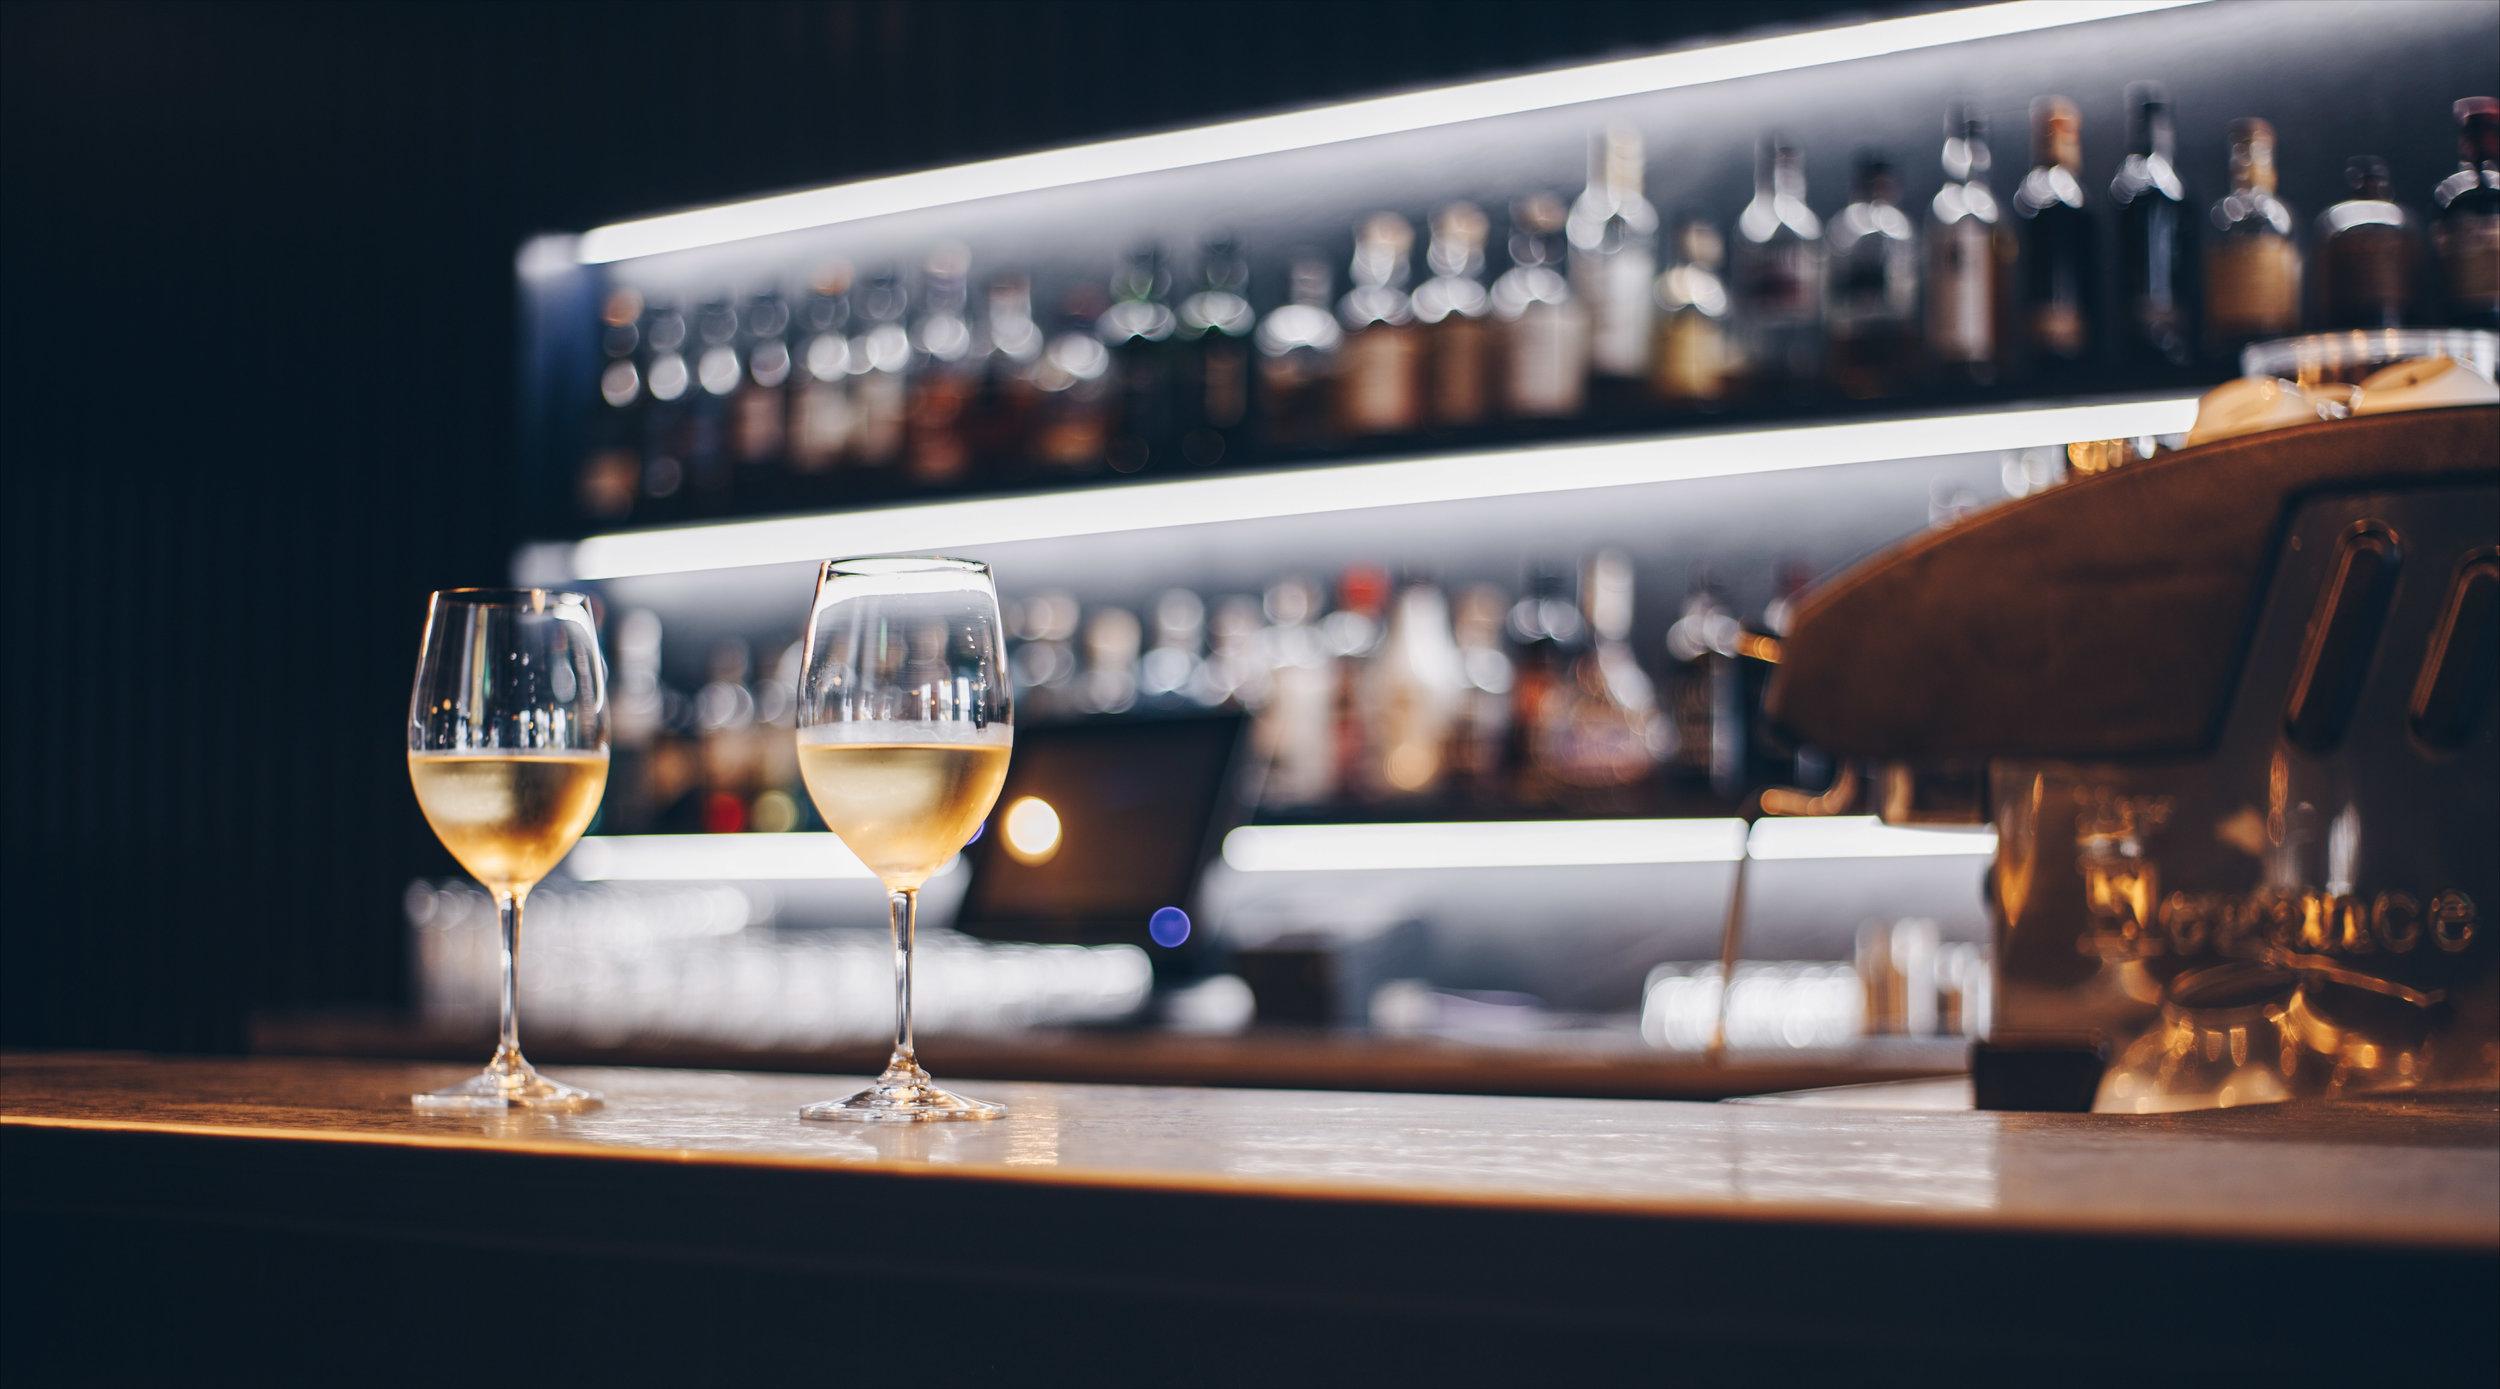 caroy-house_skye_hotel-bar_wine-2.jpg